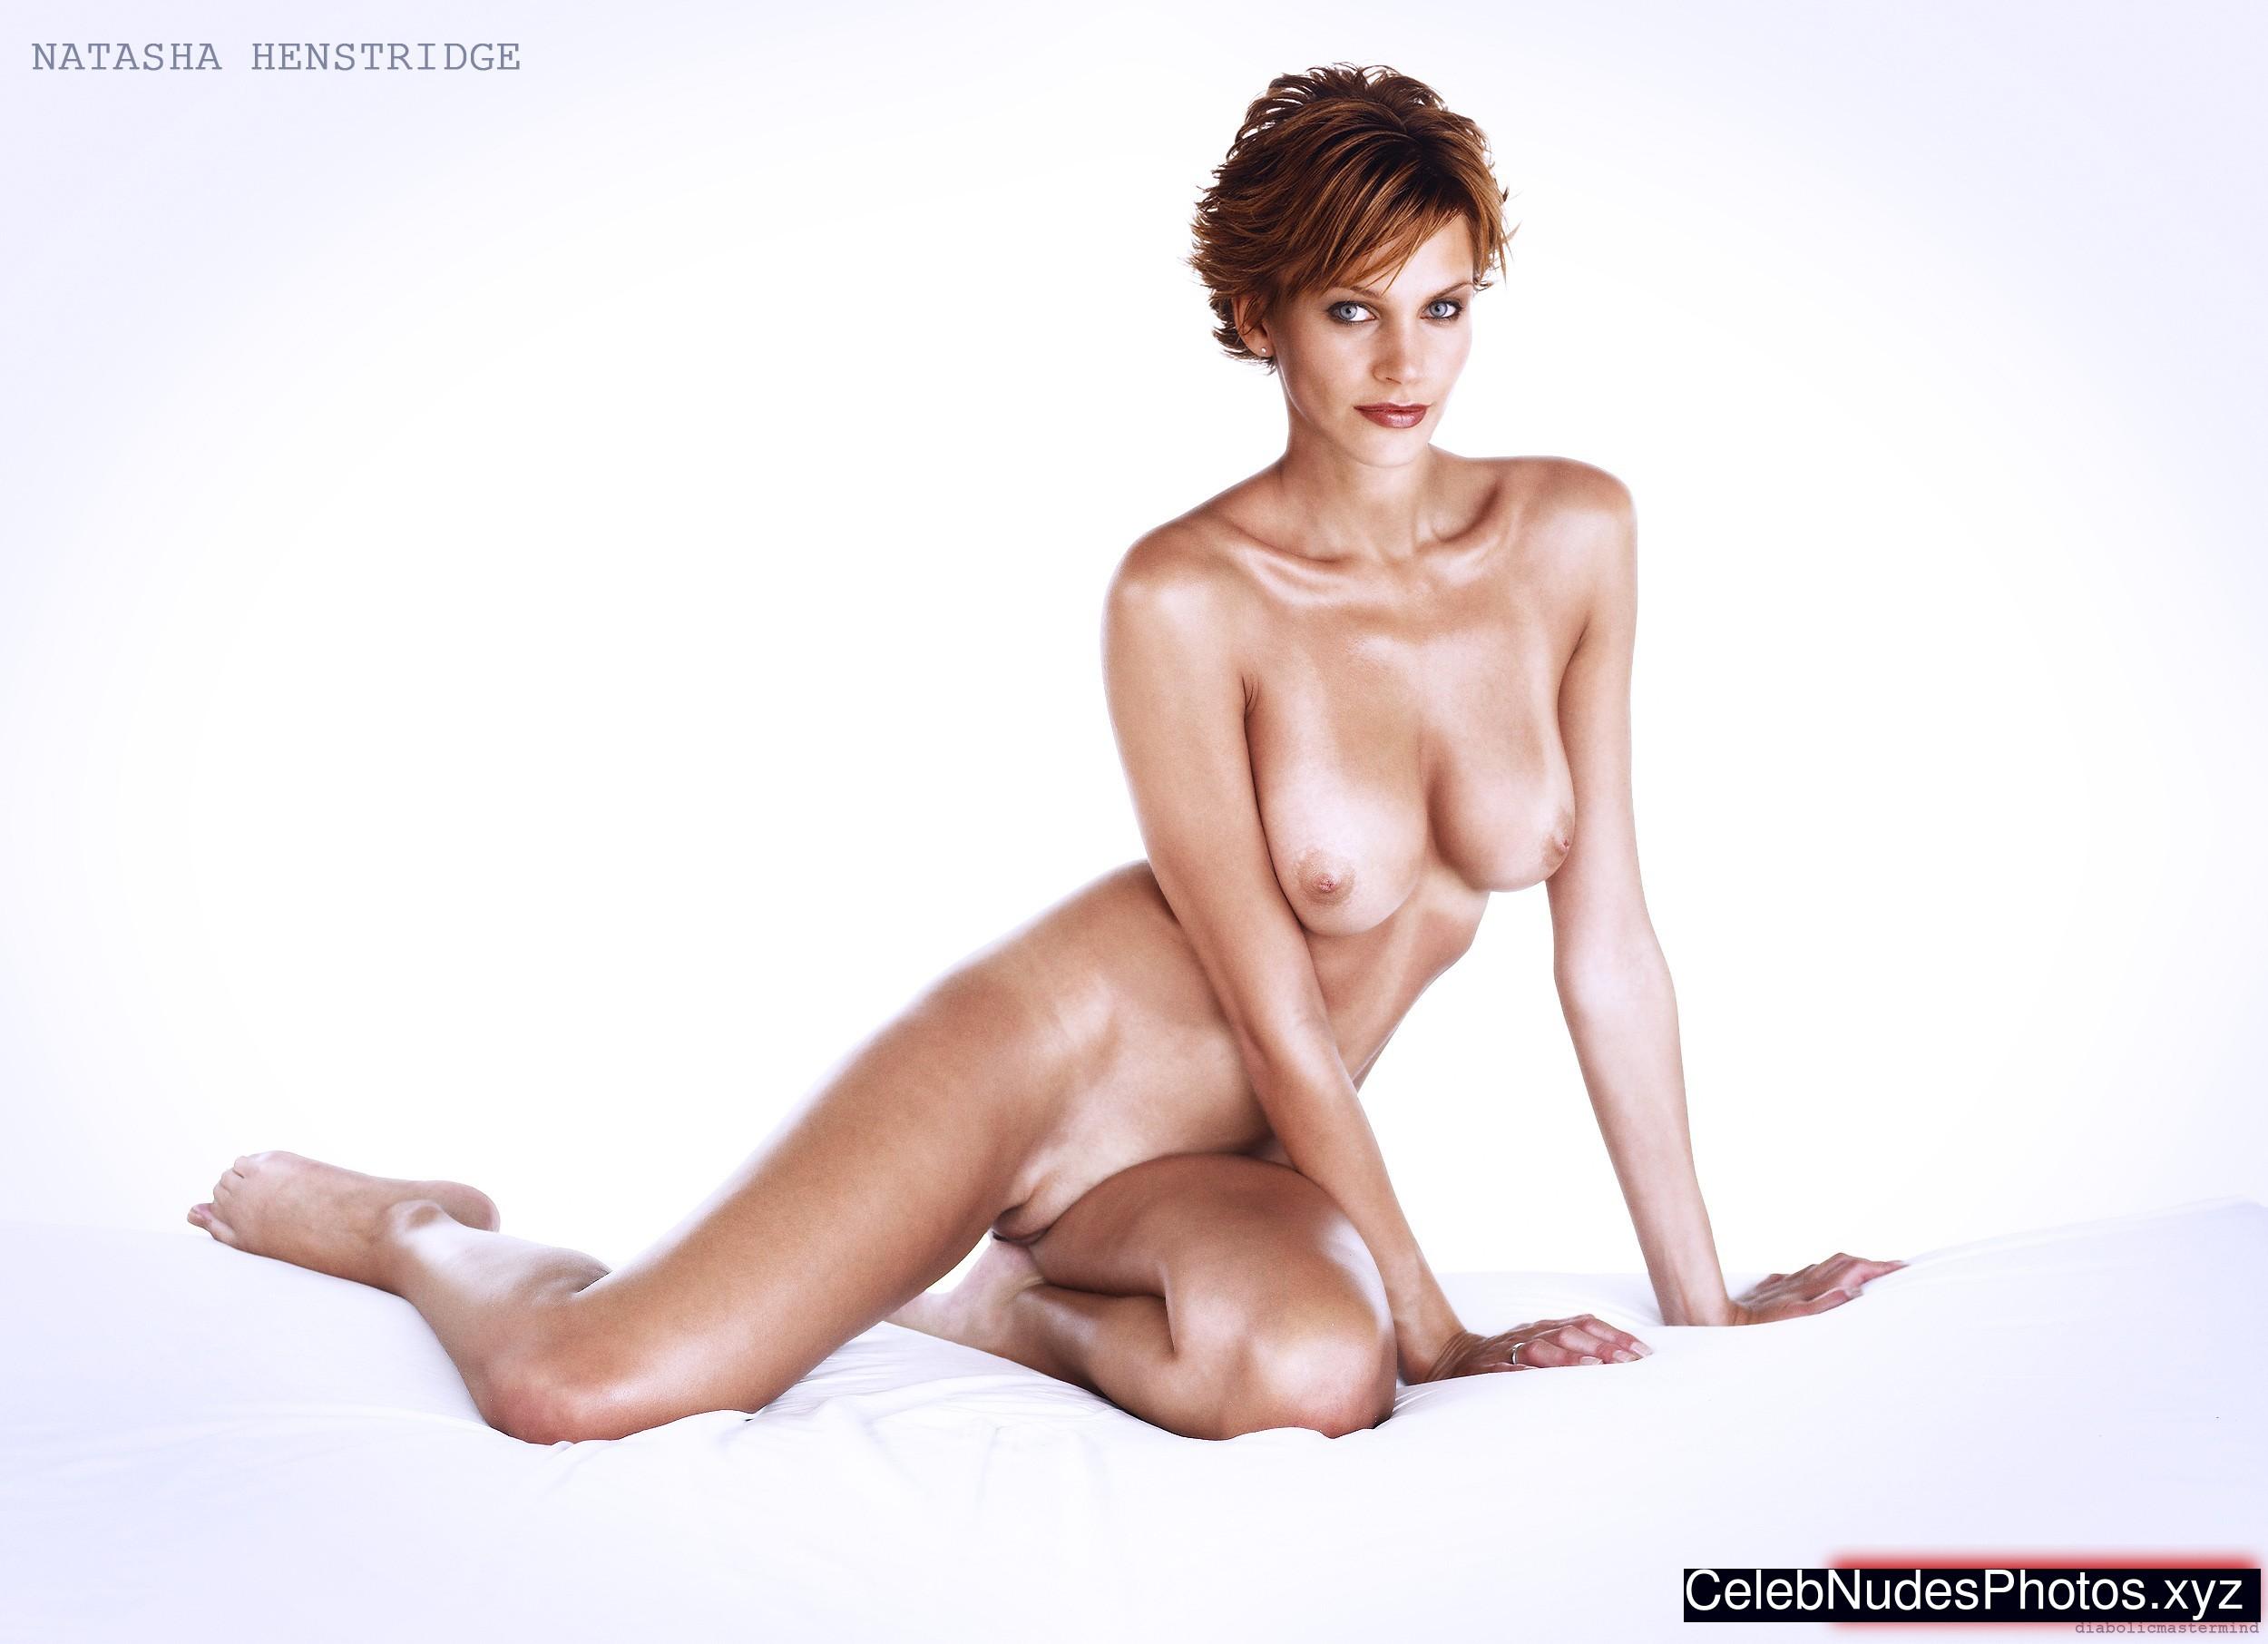 natasha henstridge pussy pics